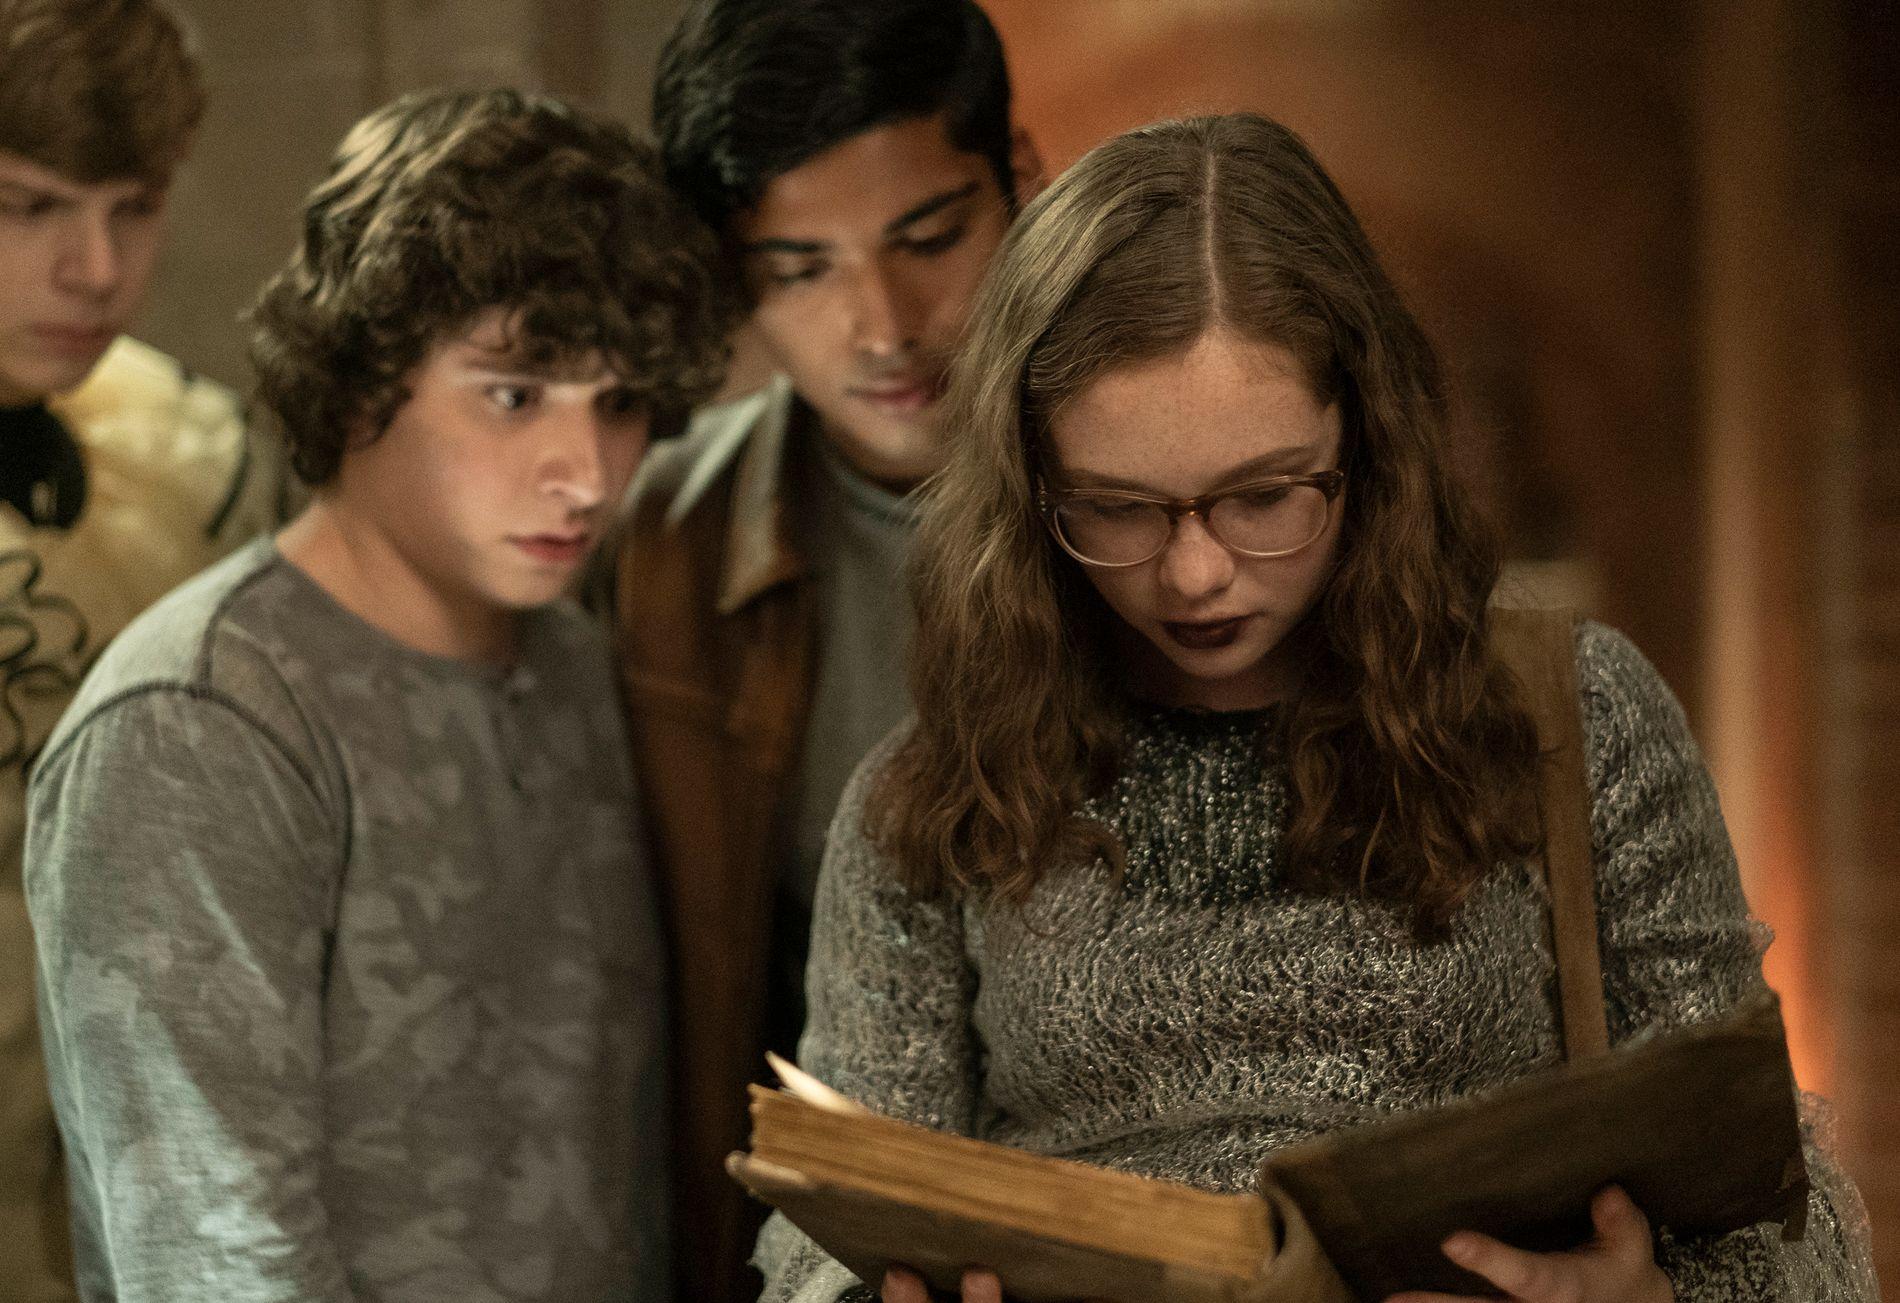 BOKEN SOM SKRIVER SEG SELV: Austin Zajur, Michael GArza og Zoe Margaret Colletti i «Scary Stories To Tell In The Dark».